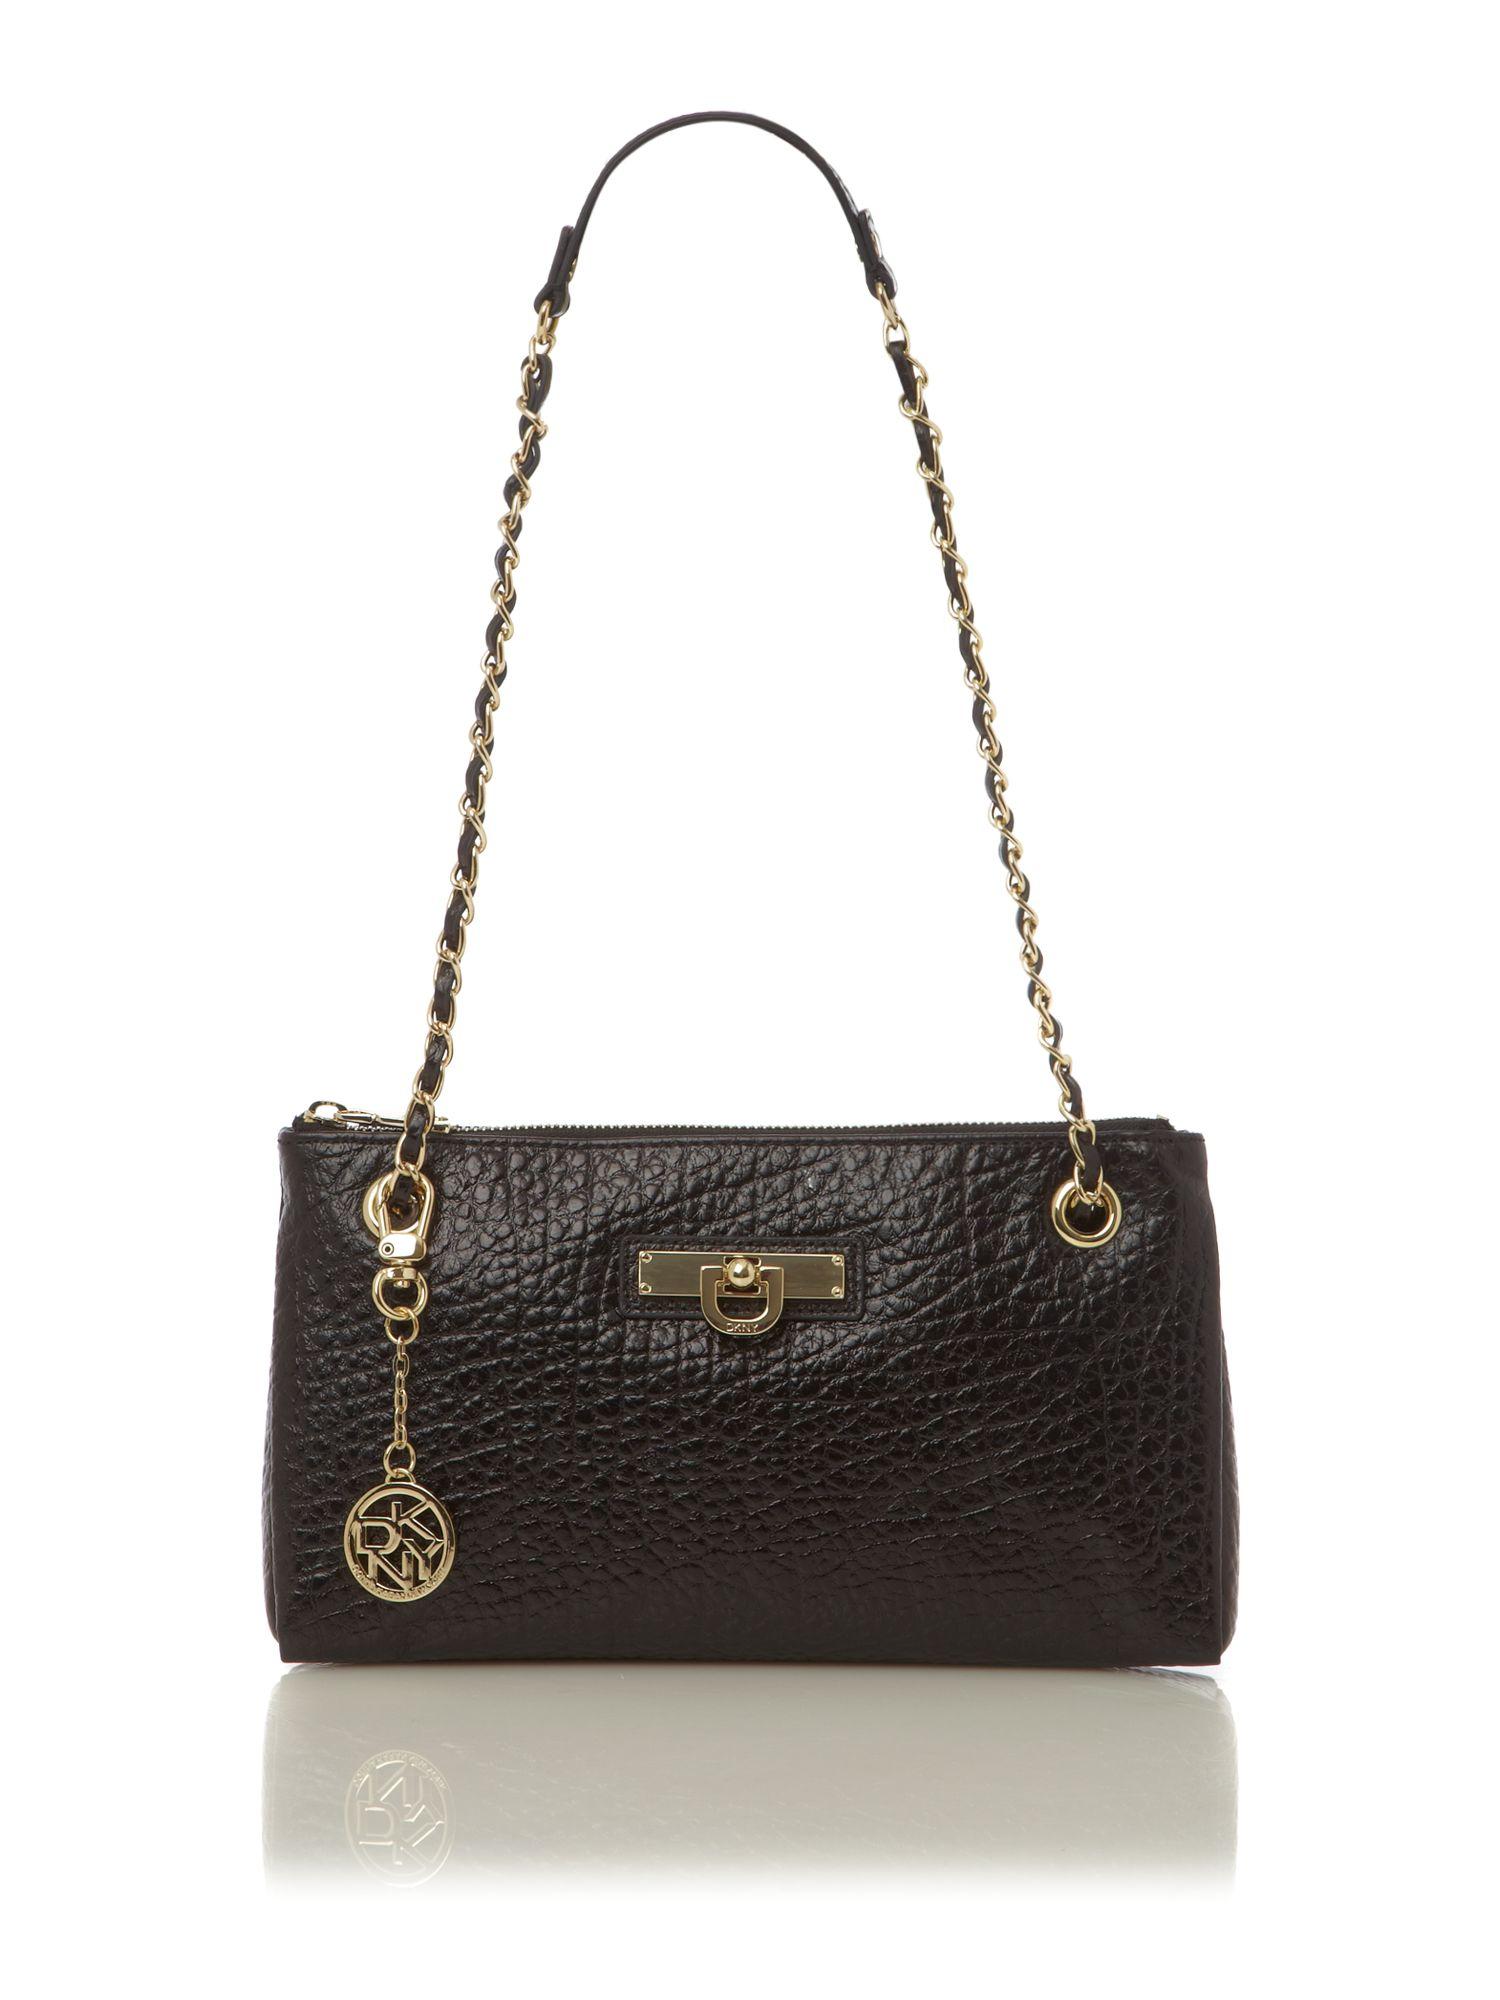 dkny item crossbody bag leather travel bags